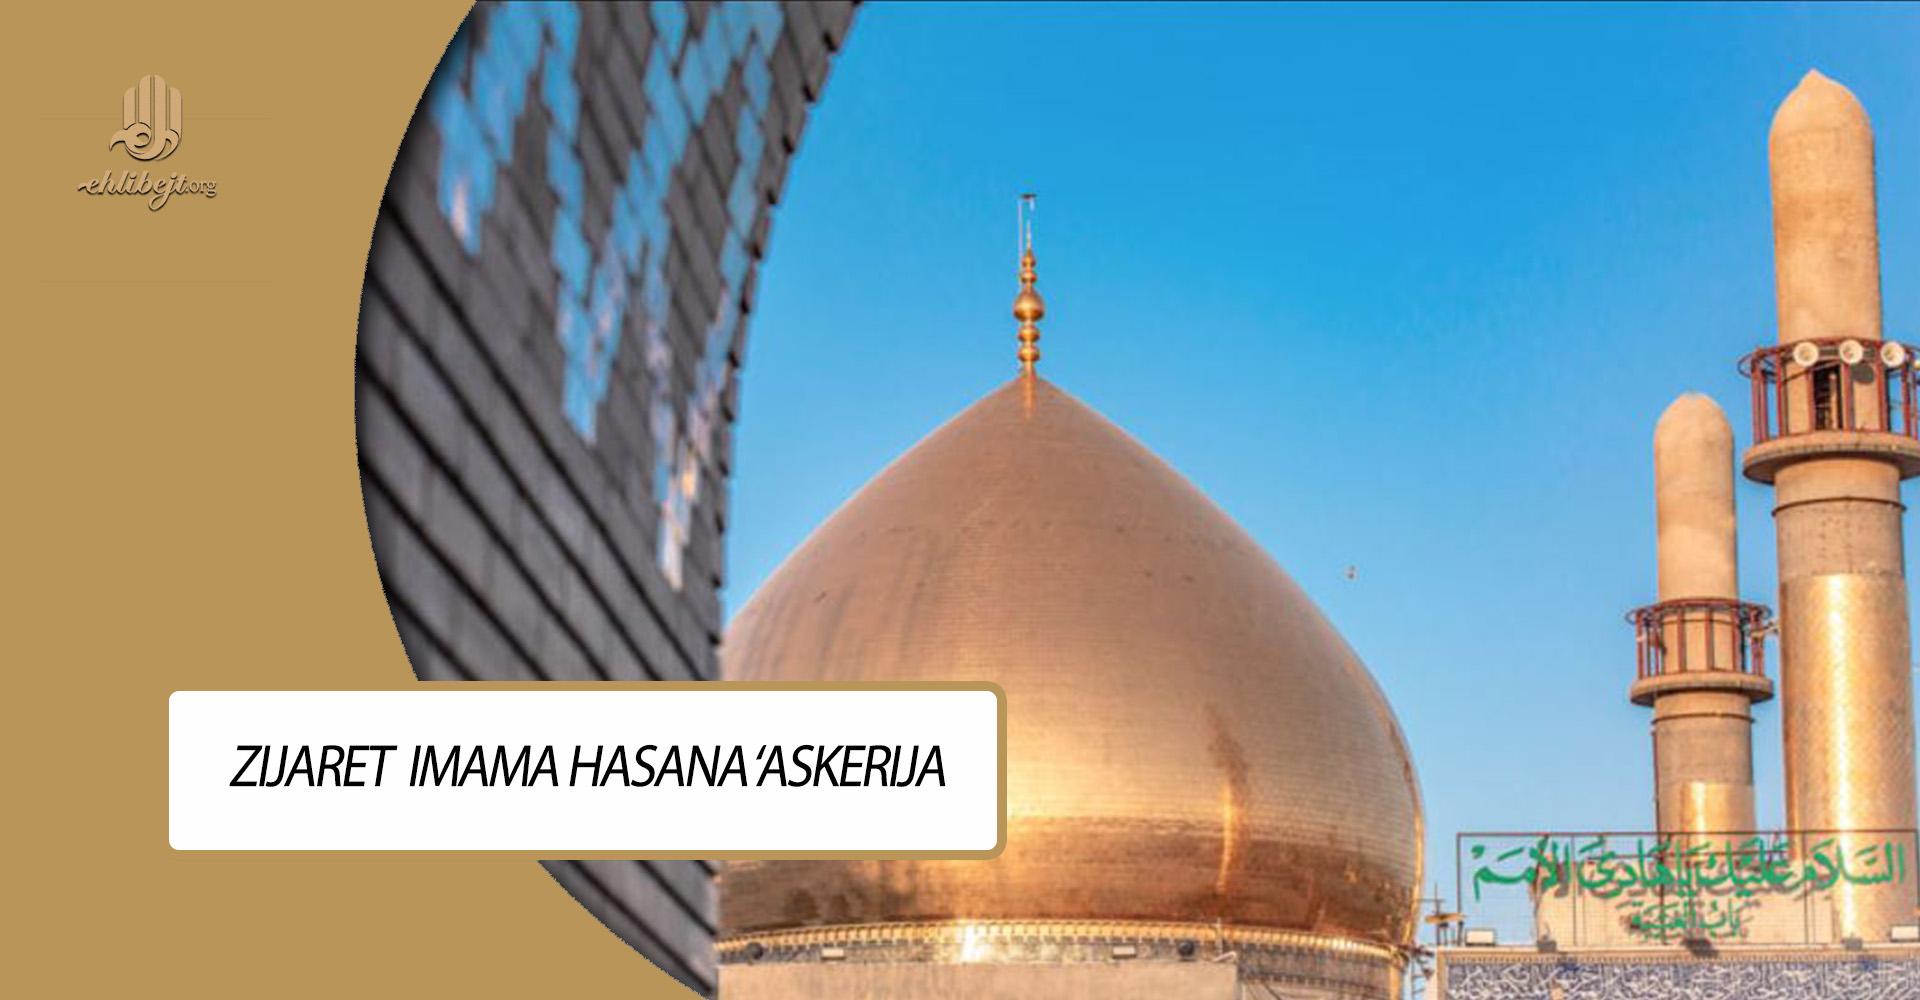 Zijaret Imama Hasana ibn Alija 'Askerija, a.s.